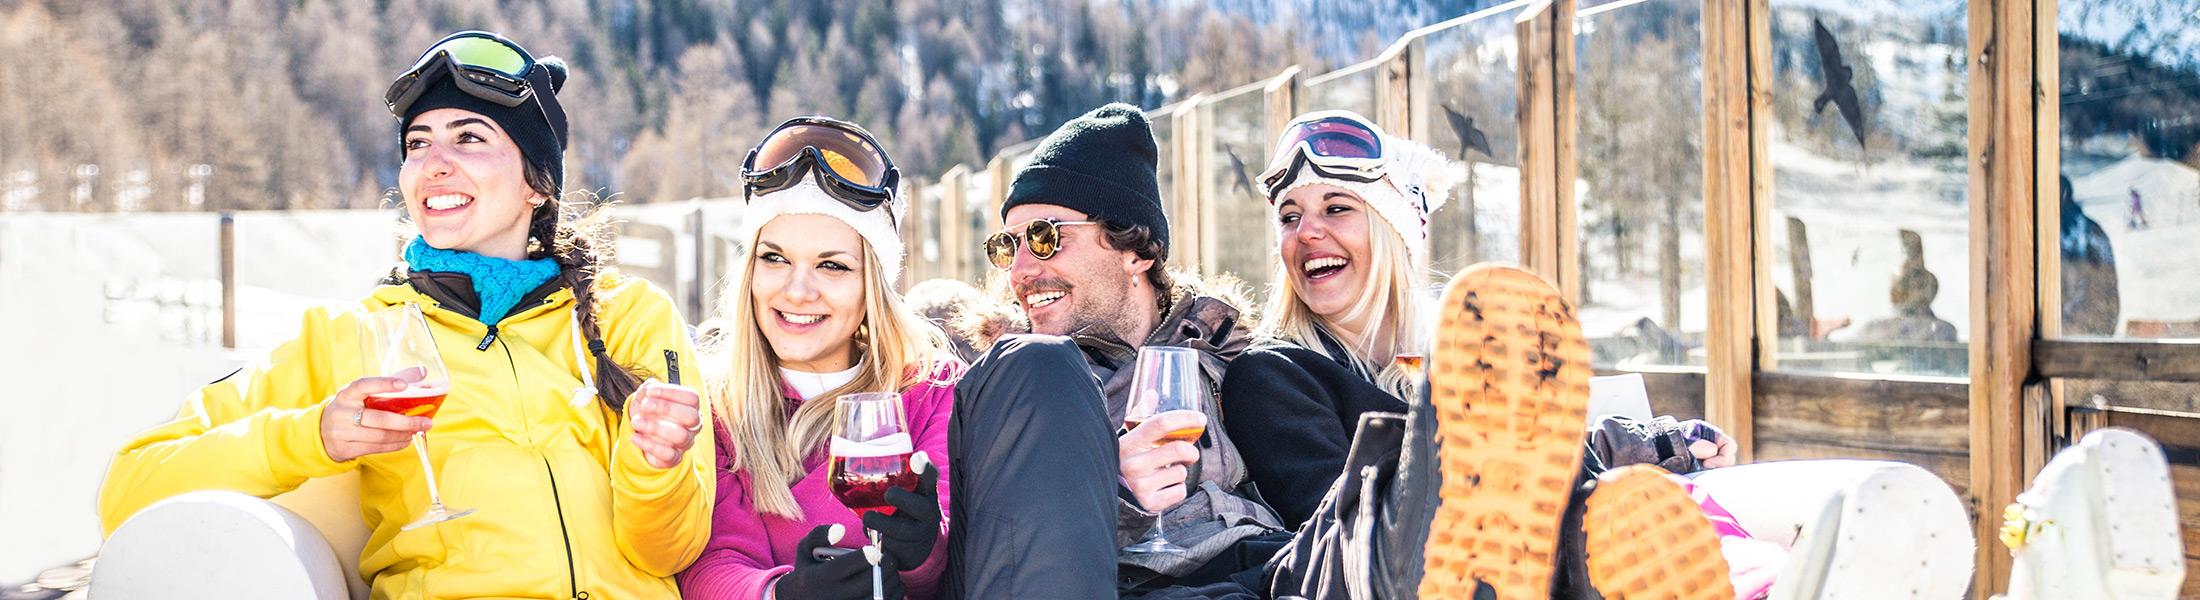 Friends at Apres Ski on a ski holiday